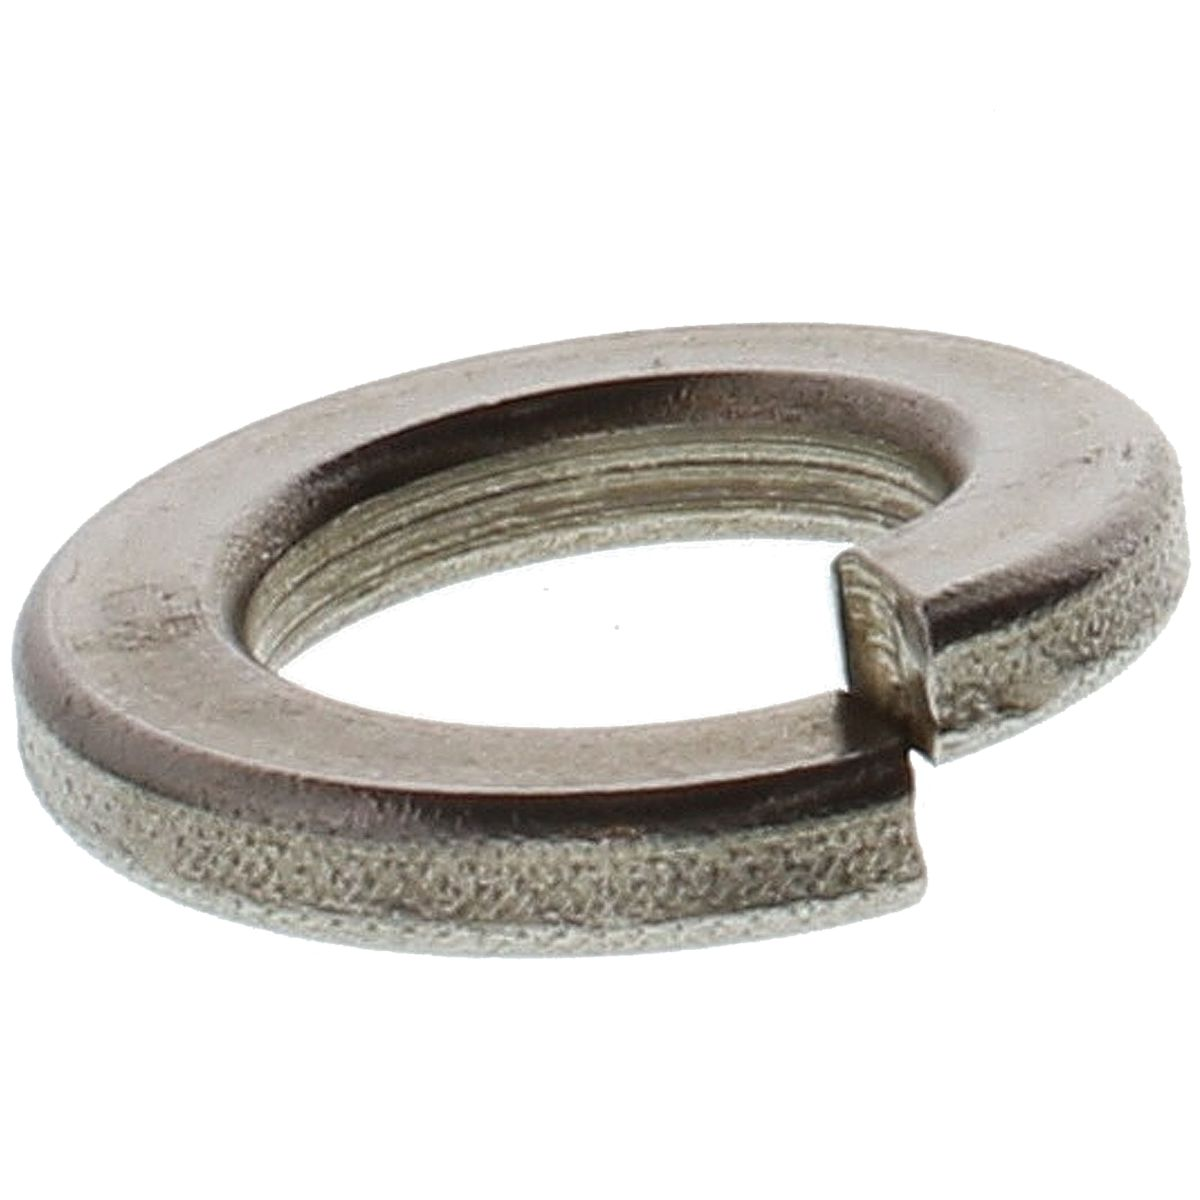 #12 Medium Lock Washers — 18-8 Stainless Steel, 100/PKG